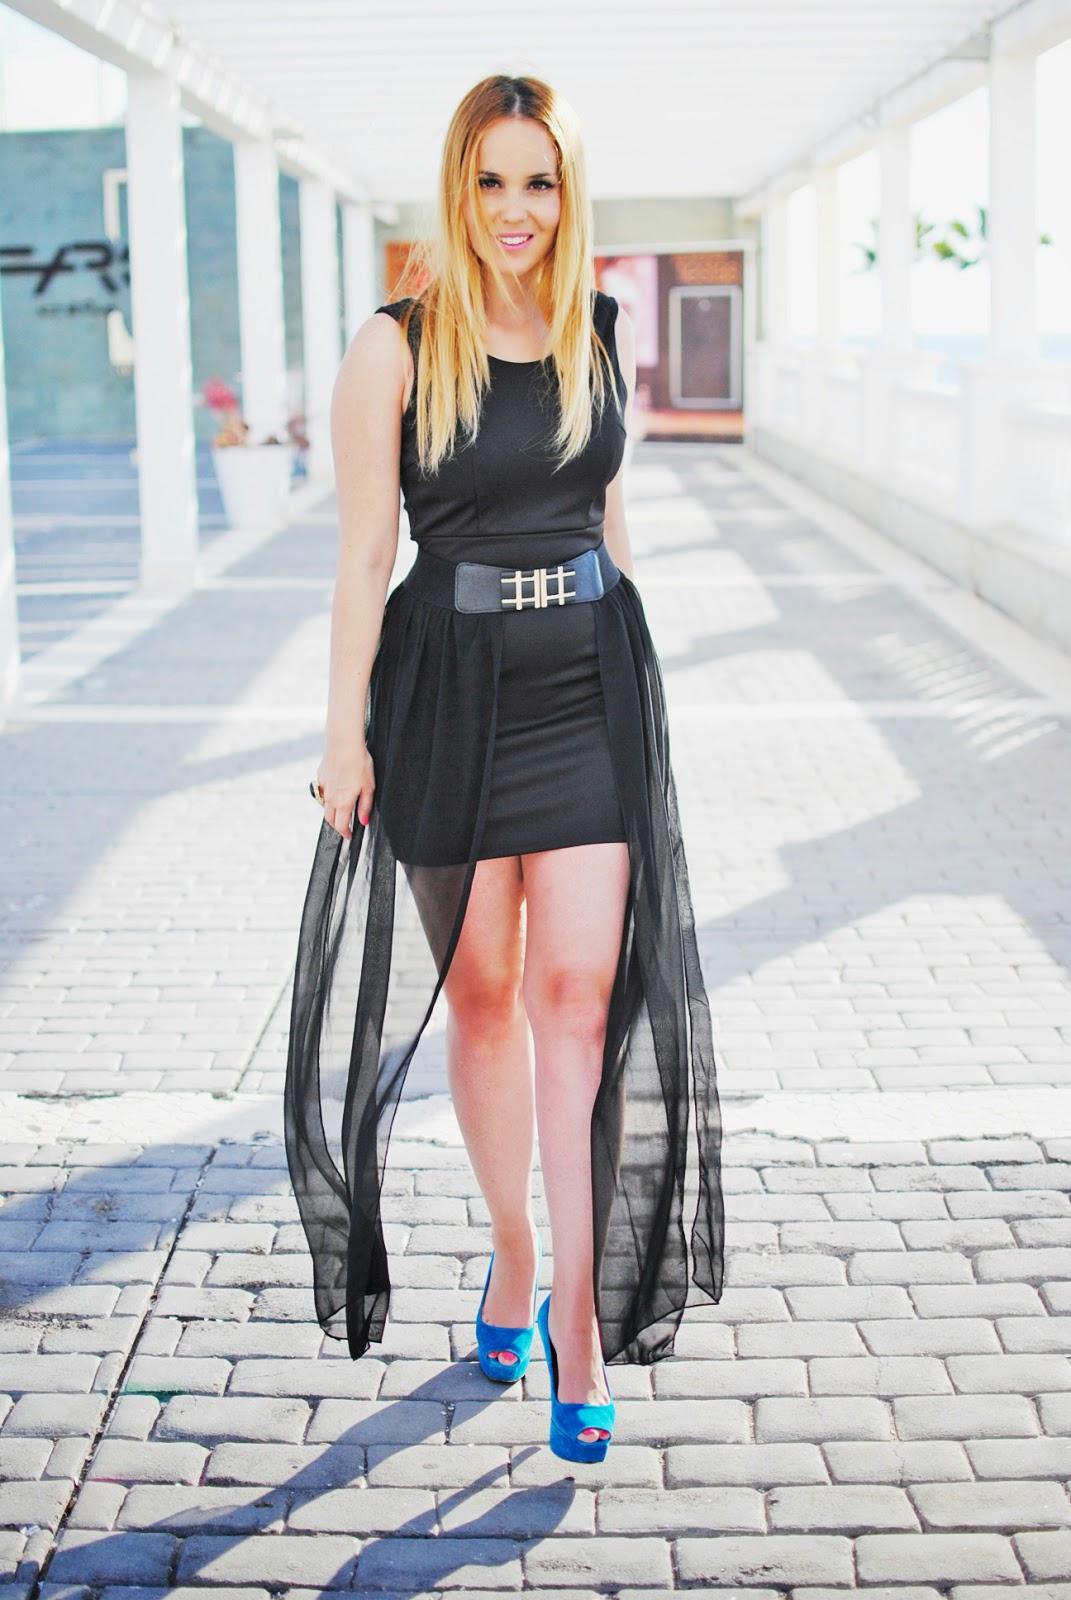 nery hdez, vestido q2, blonde, lbd, little black dress, vestido negro, vestido de fiesta